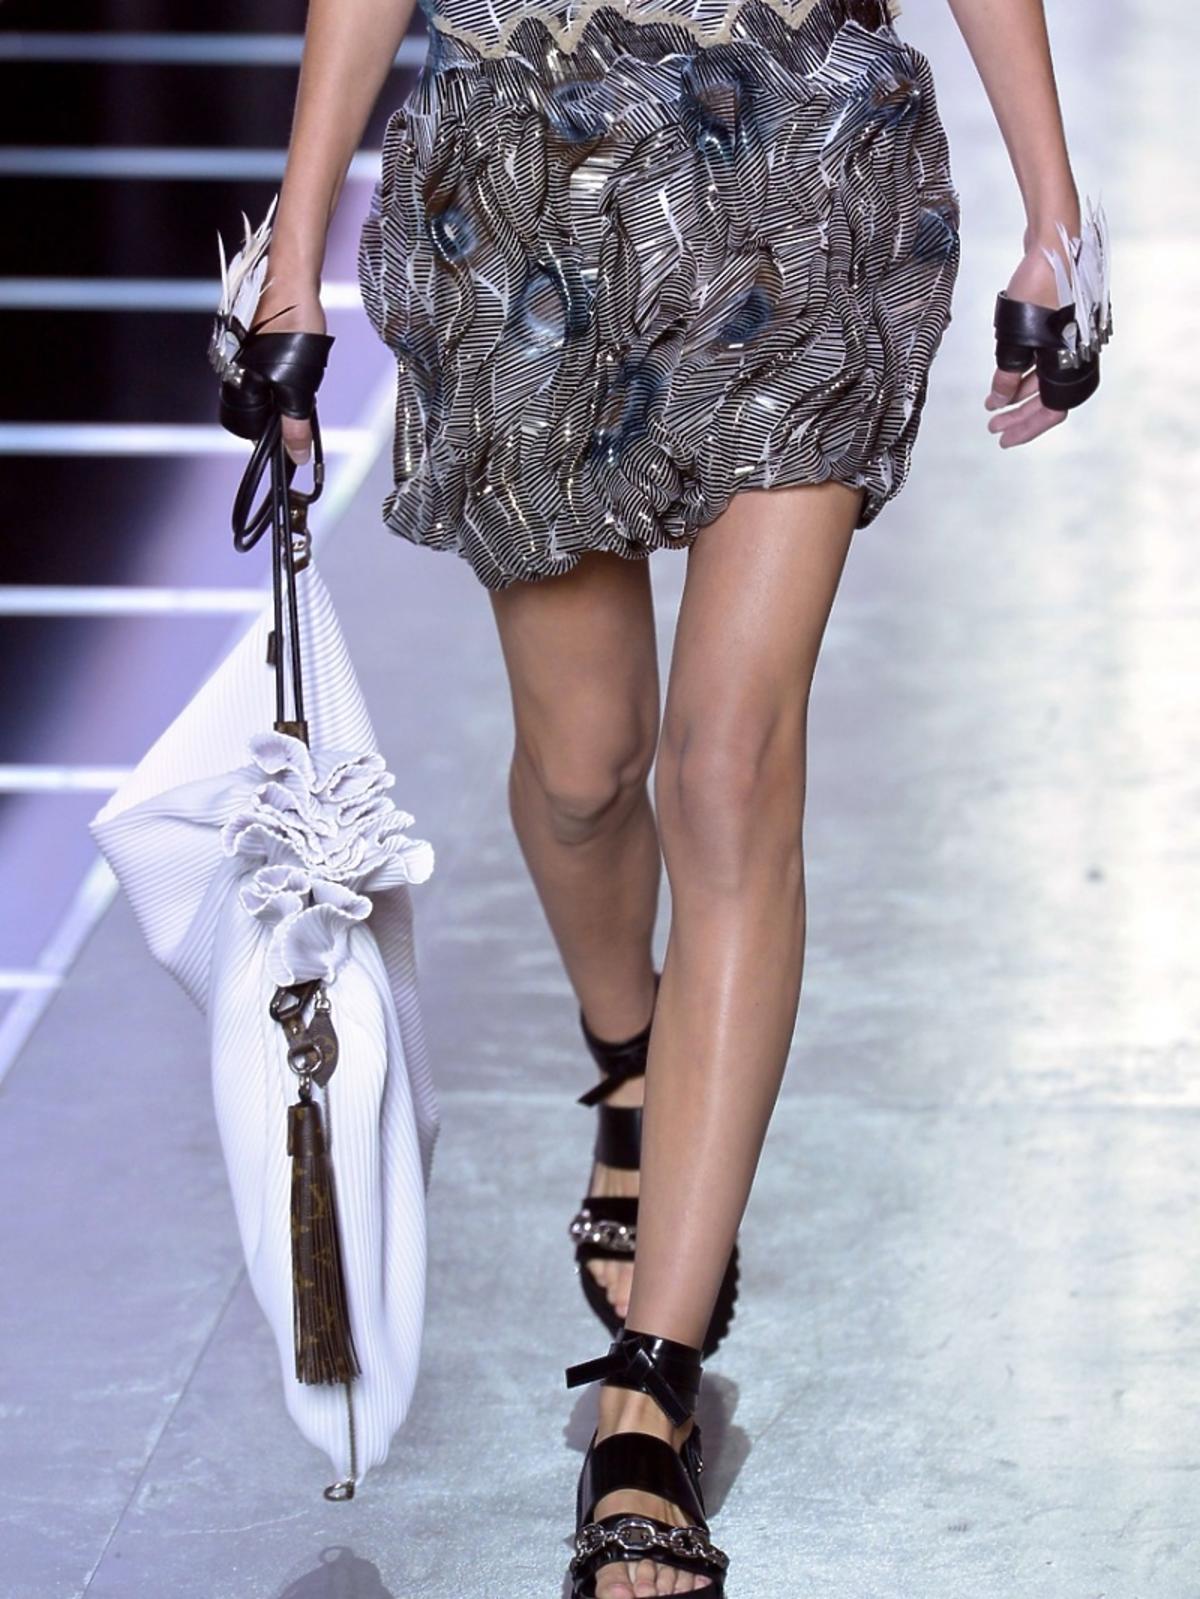 Biała torba na pokazie Louis Vuitton